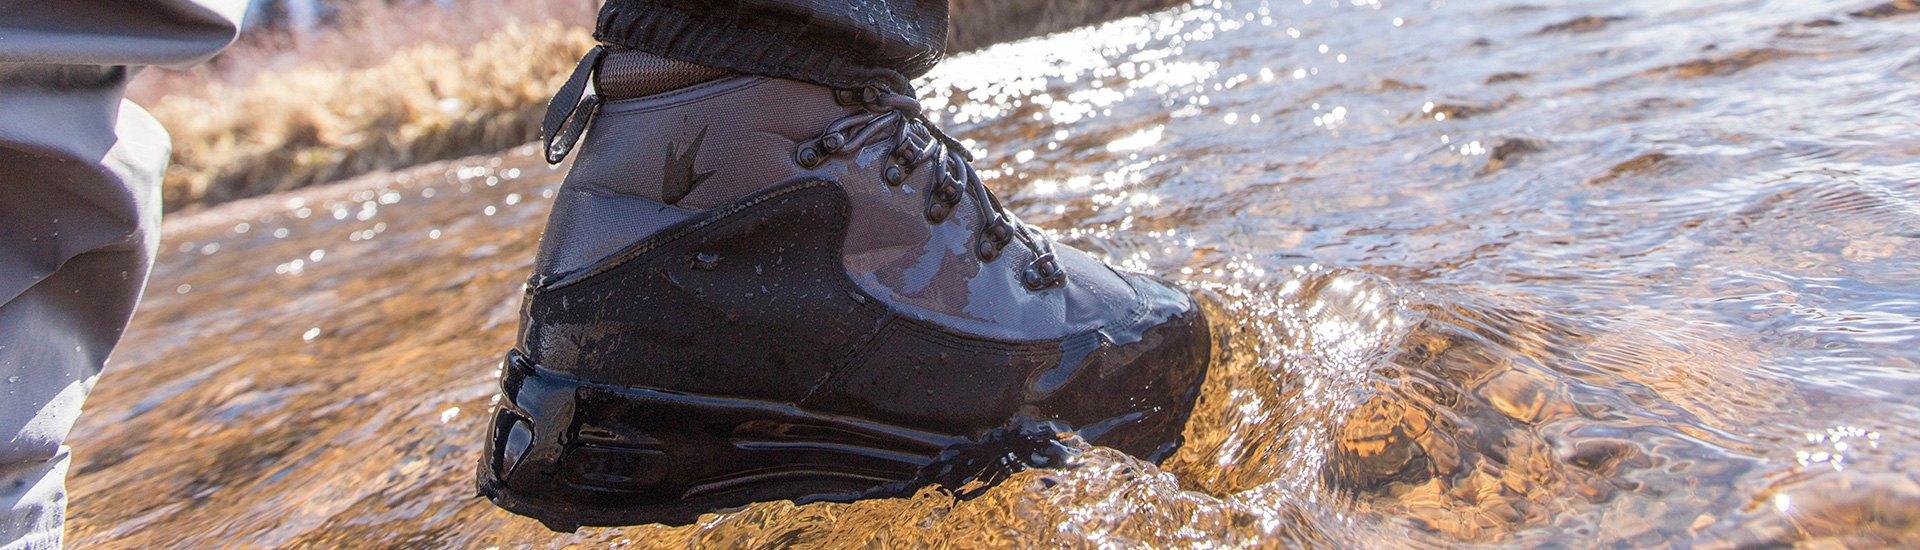 b71c7b8cc7f Boots   Walking Boots for Women & Men — RECREATIONiD.com